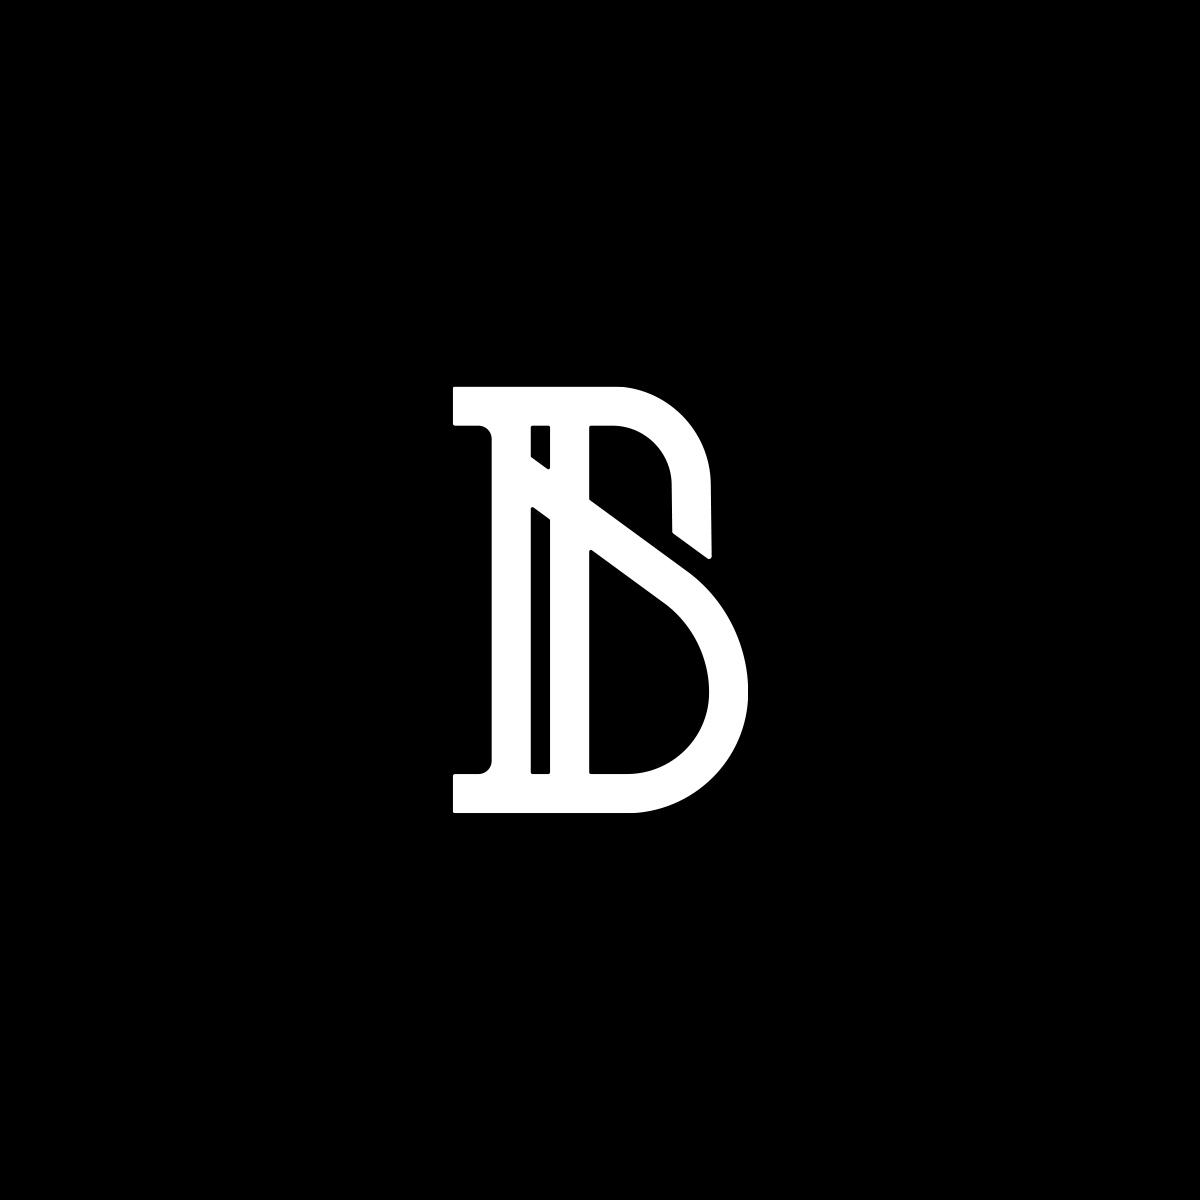 Various-Logos_B